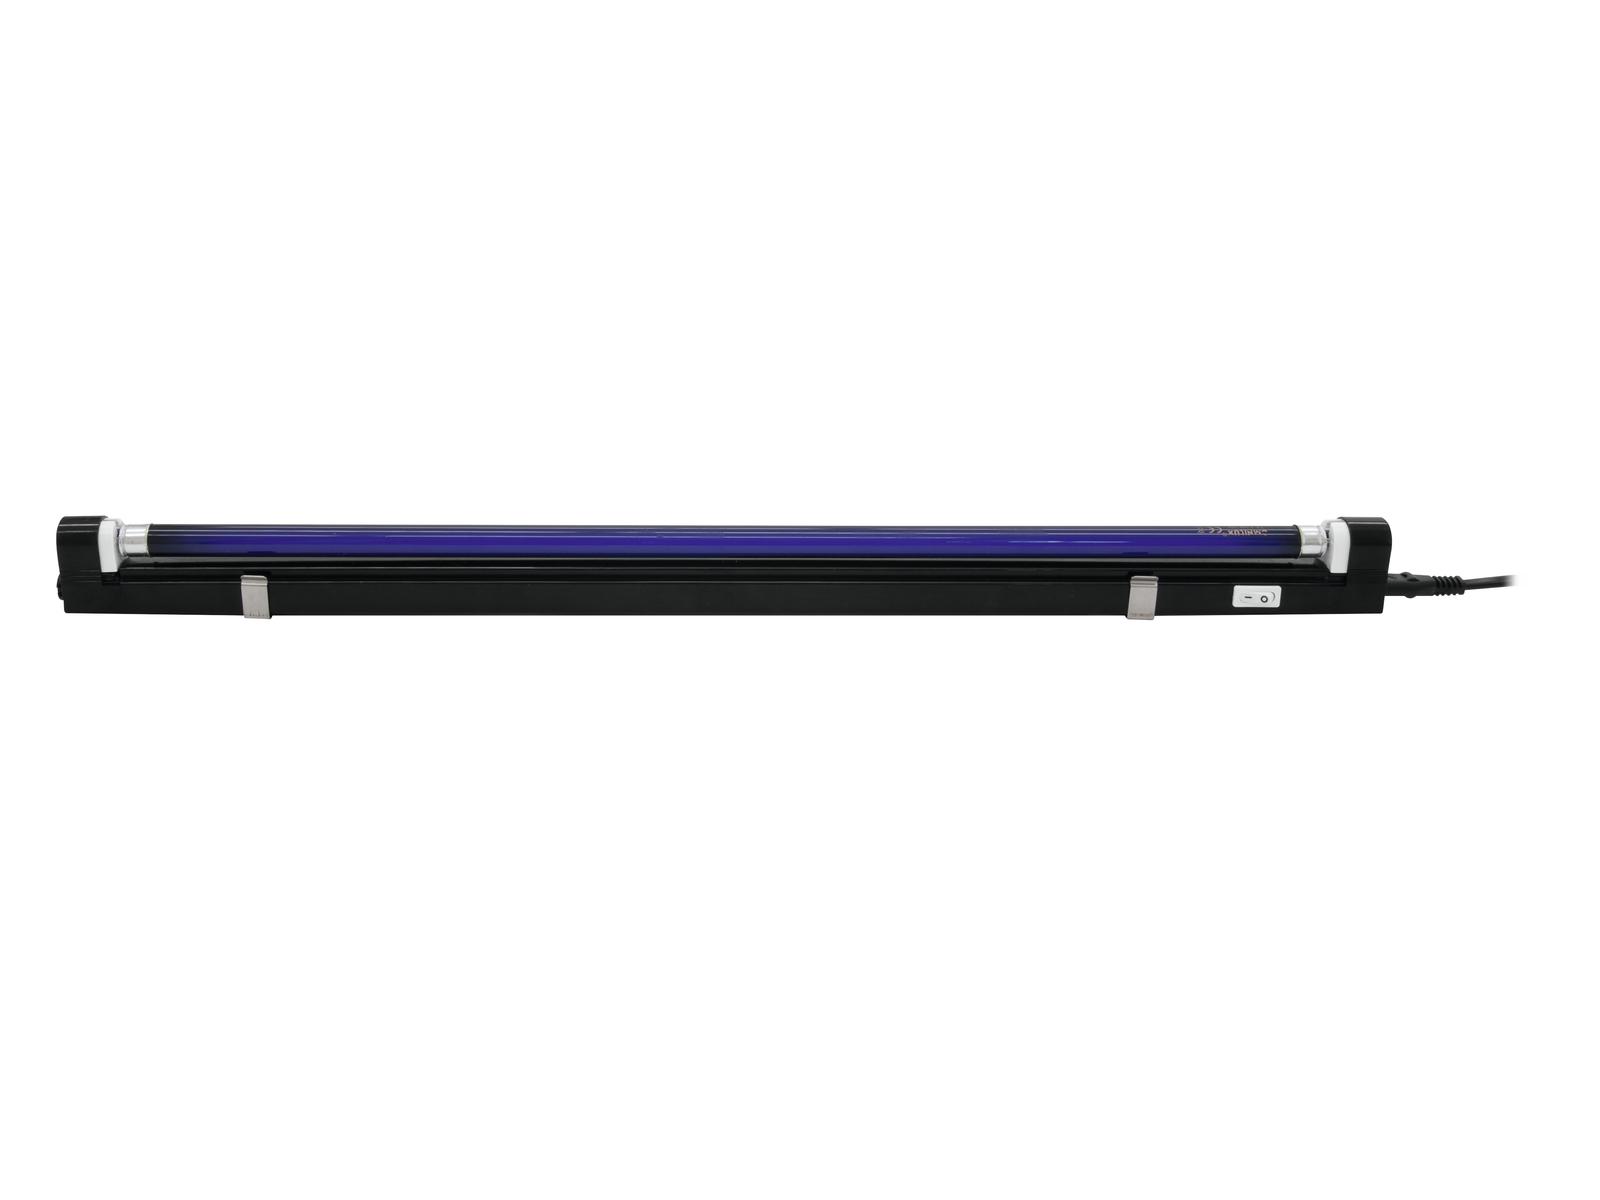 EUROLITE UV tubo completo fixt.60cm 13W ultra slim